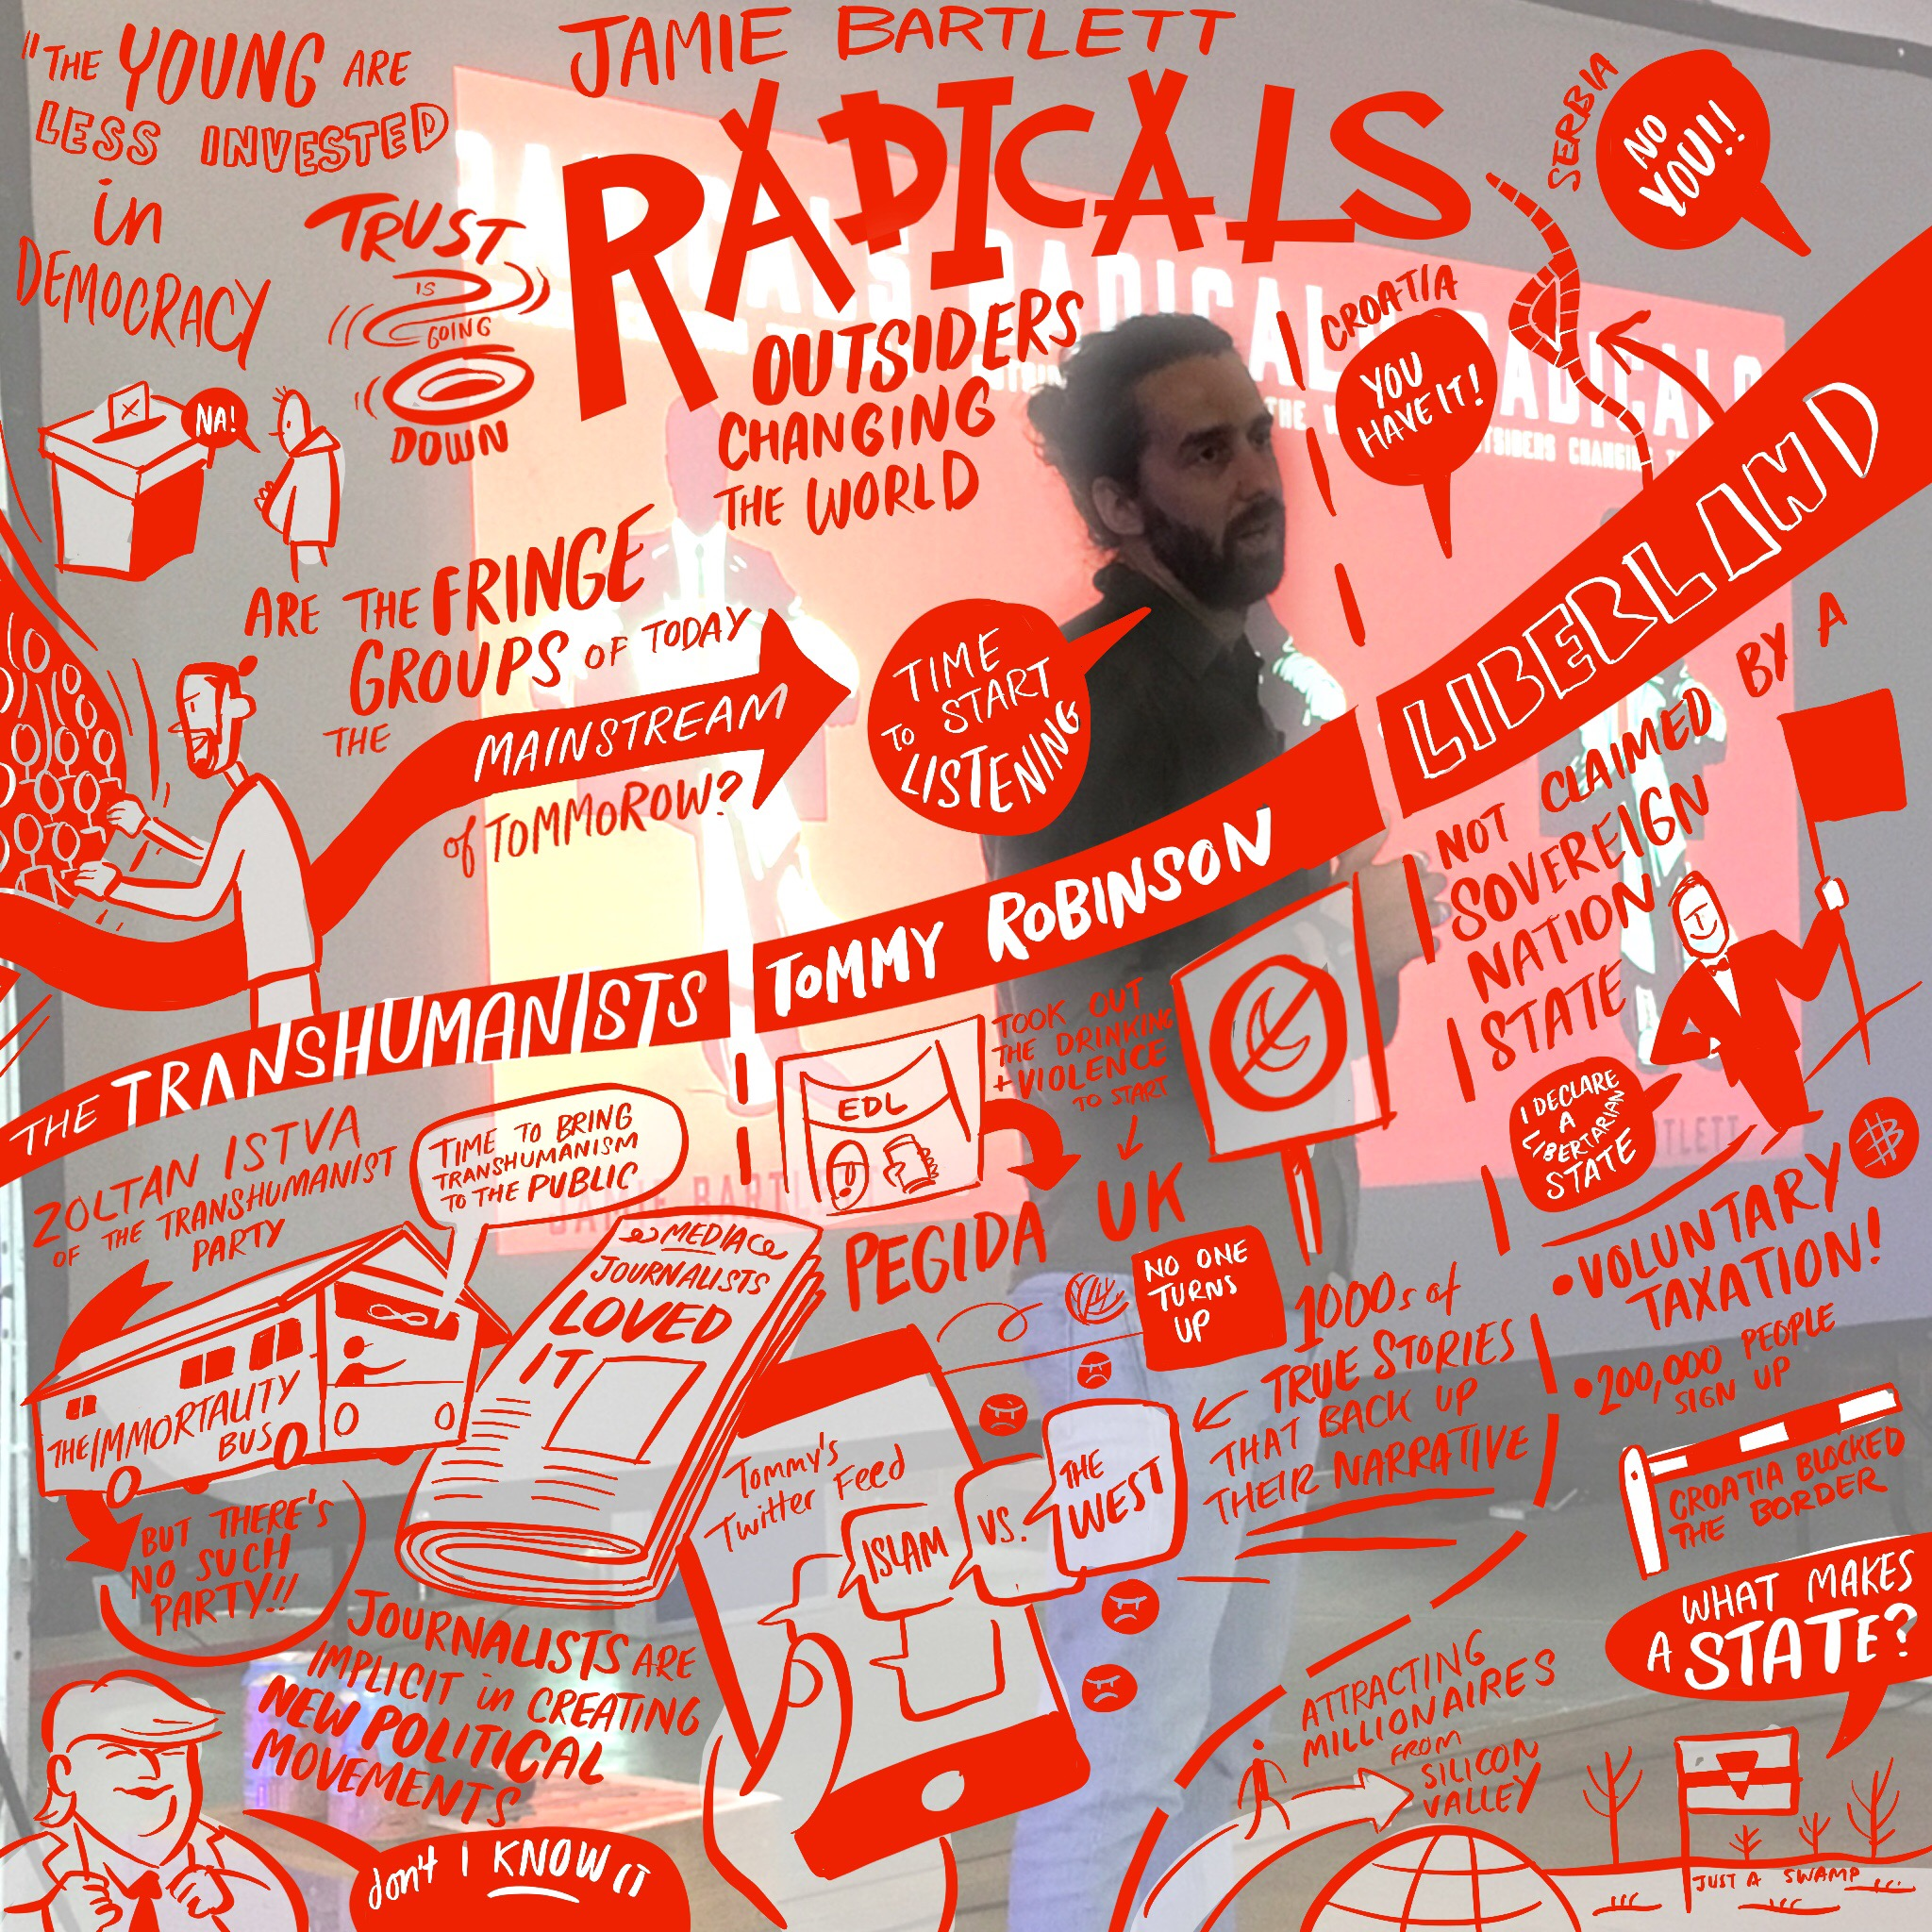 Scriberia OffGrid Sessions Jamie Bartlett Sketchnotes Sketchnoting